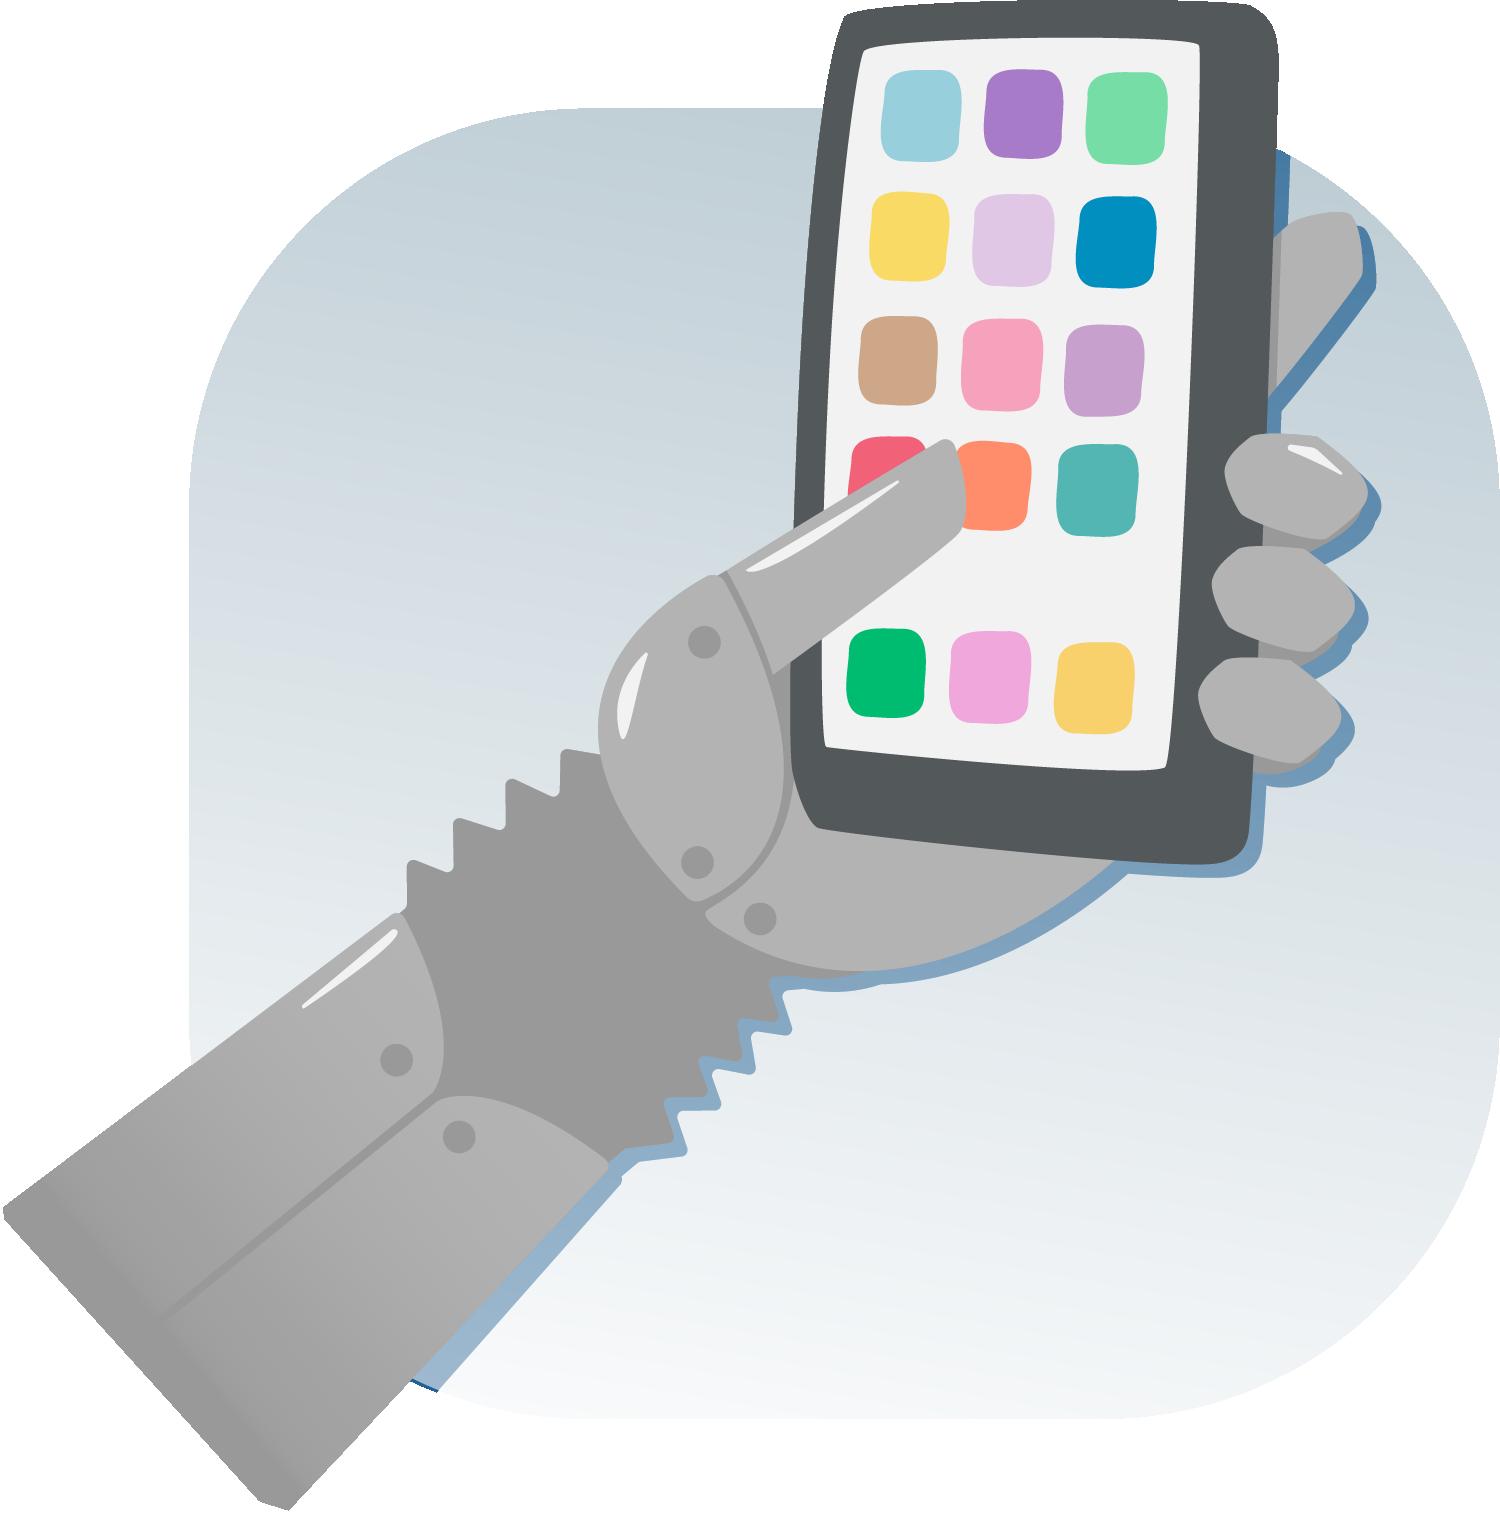 Custom-Built Mobile Applications